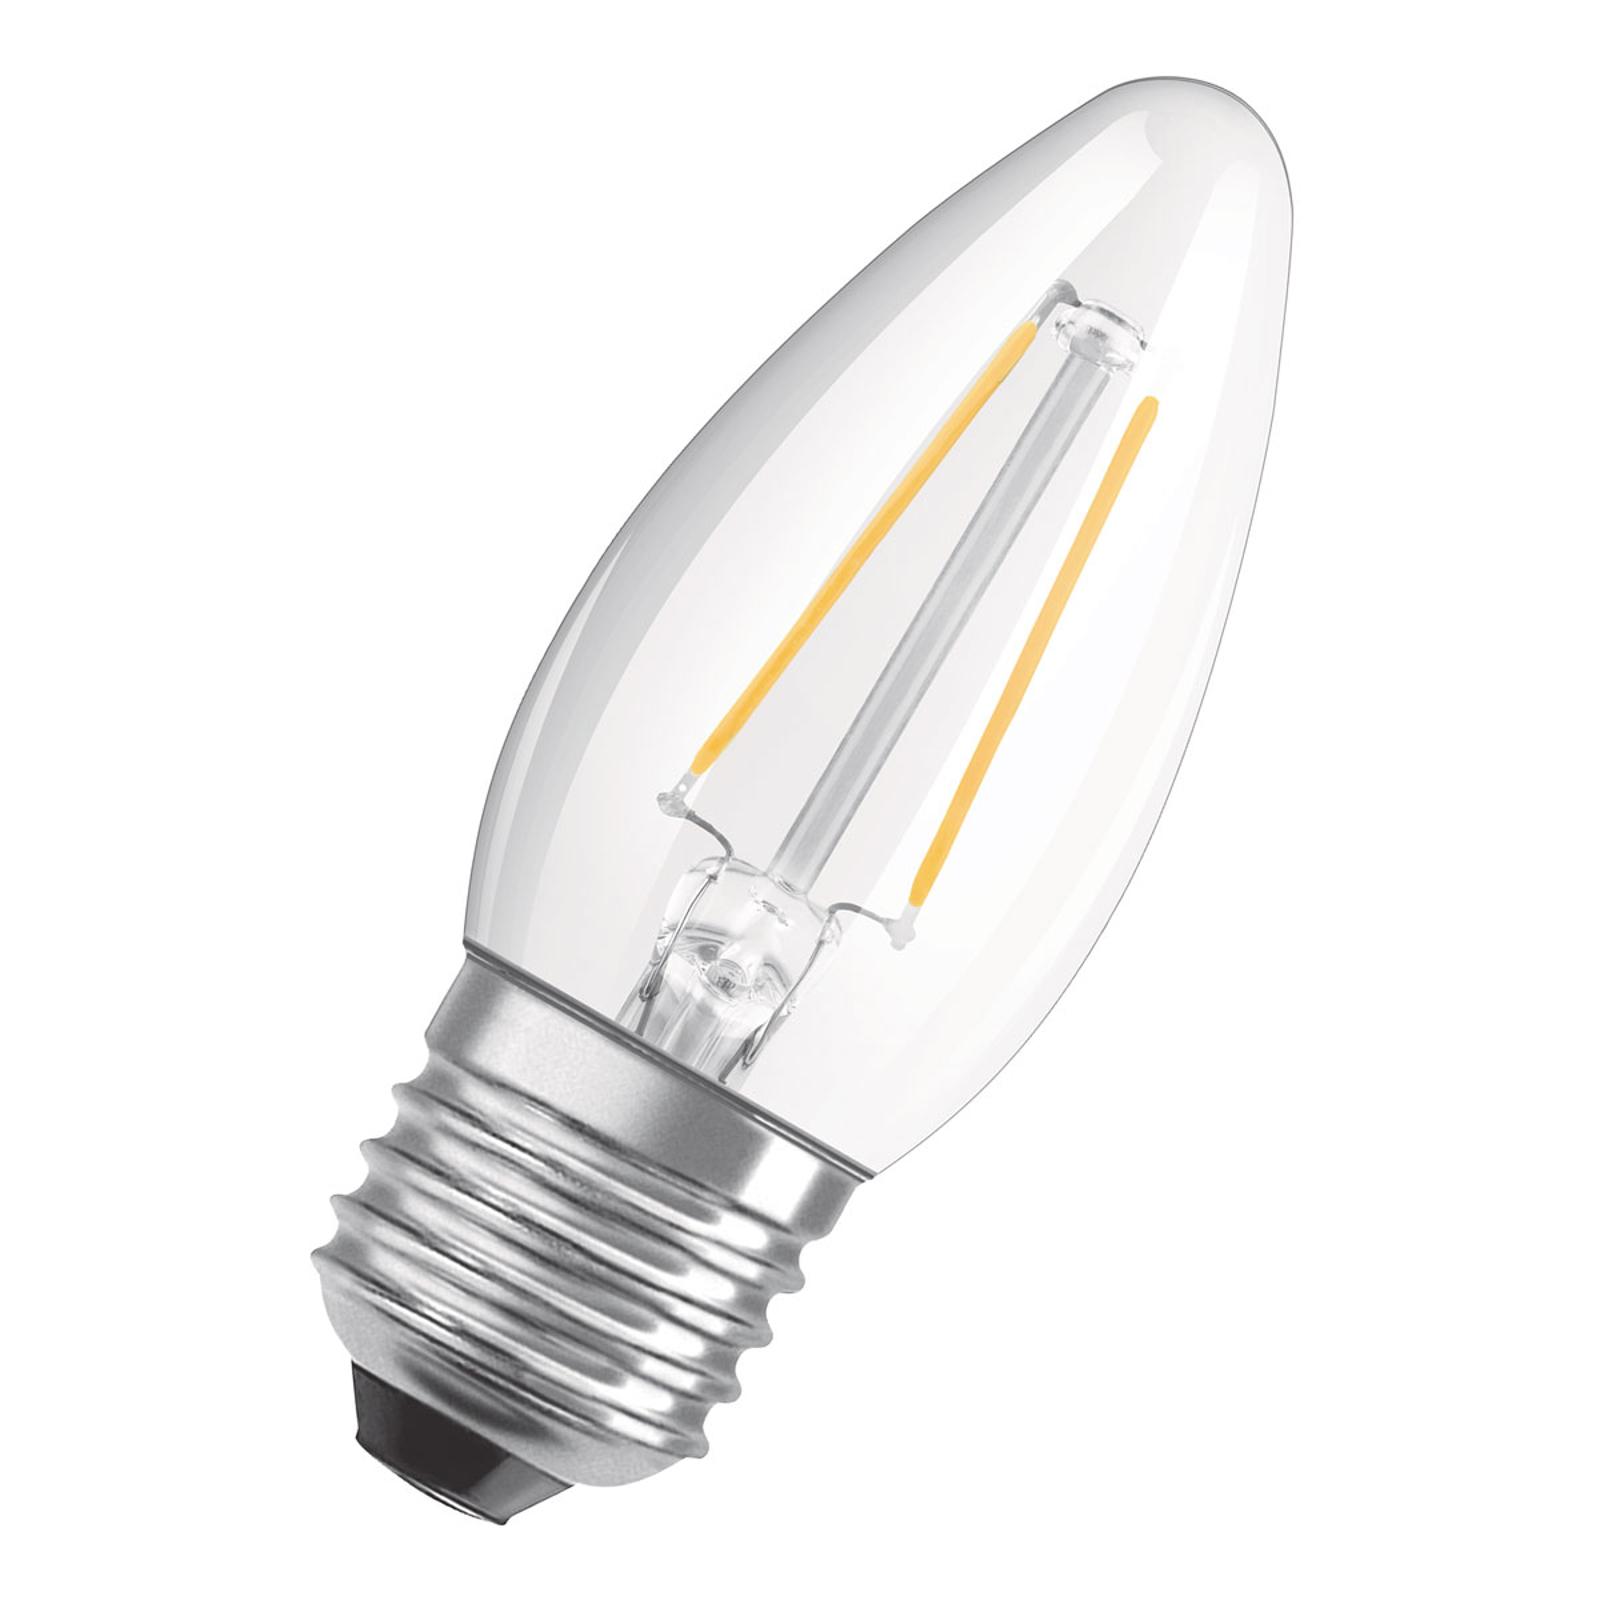 OSRAM LED-Kerzenlampe E27 5W warmweiß dimmbar klar